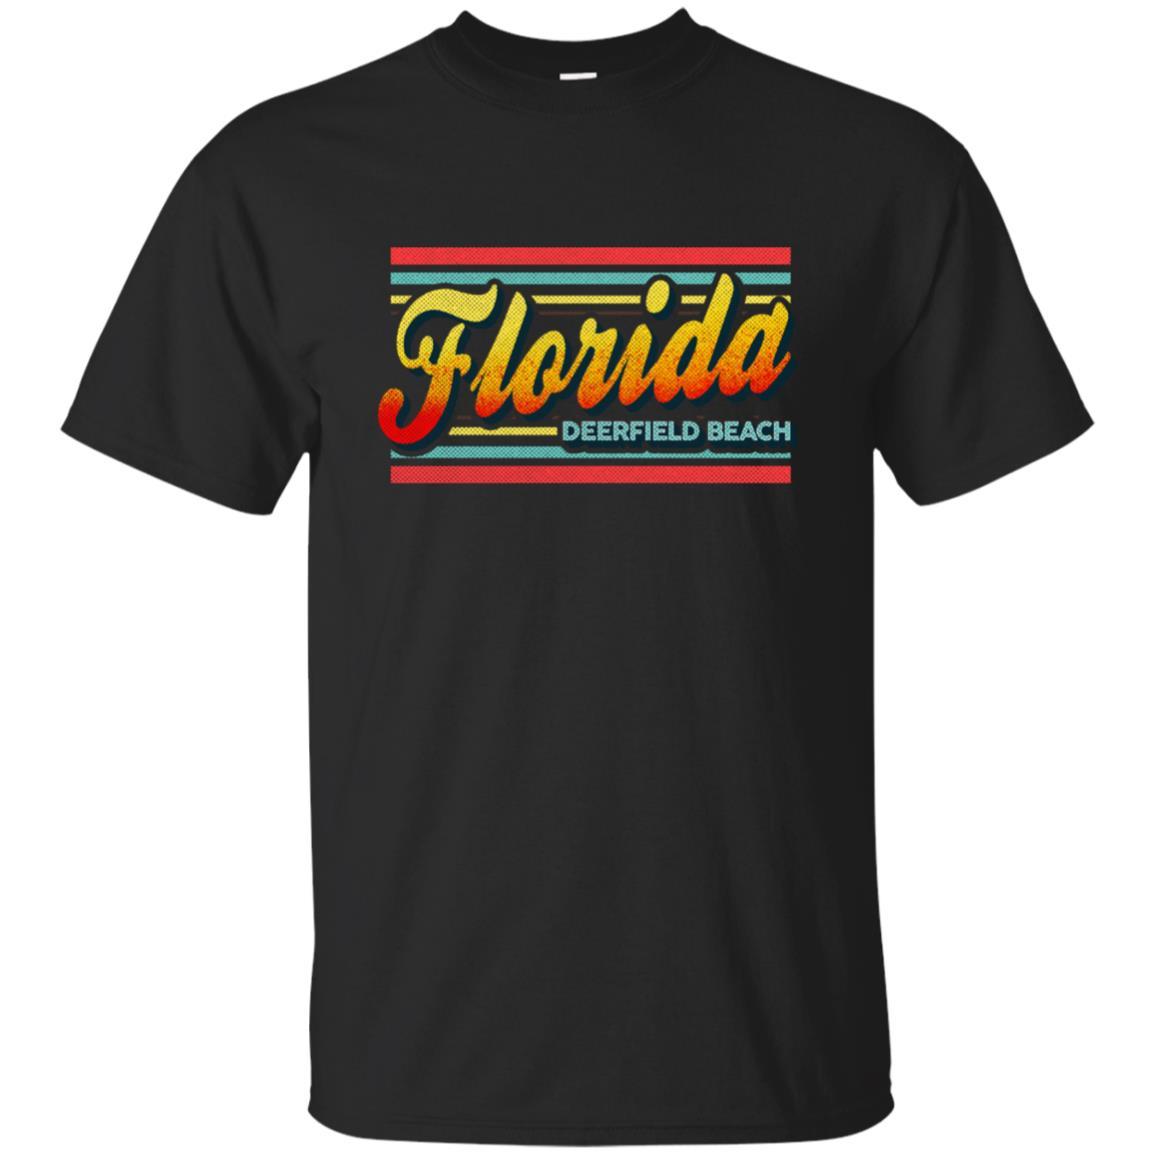 Deerfield Beach Florida Retro Vintage 80s Unisex Short Sleeve